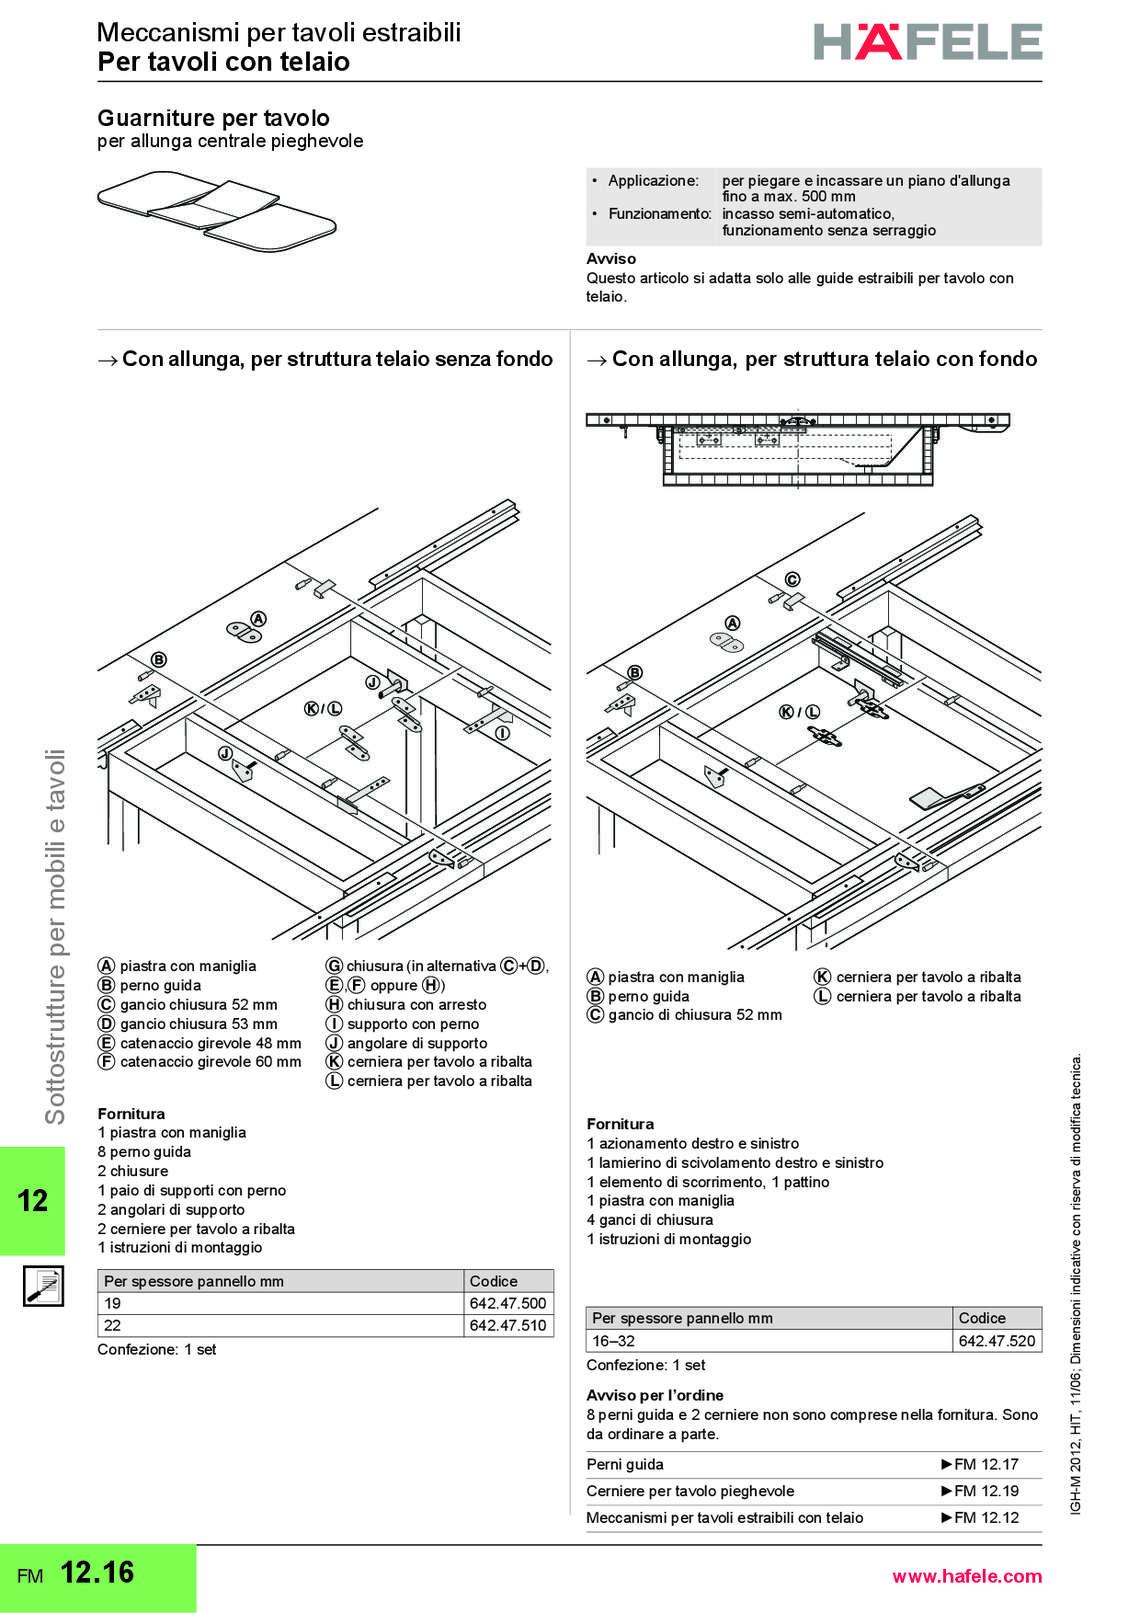 hafele-sottostrutture-per-mobili_83_031.jpg